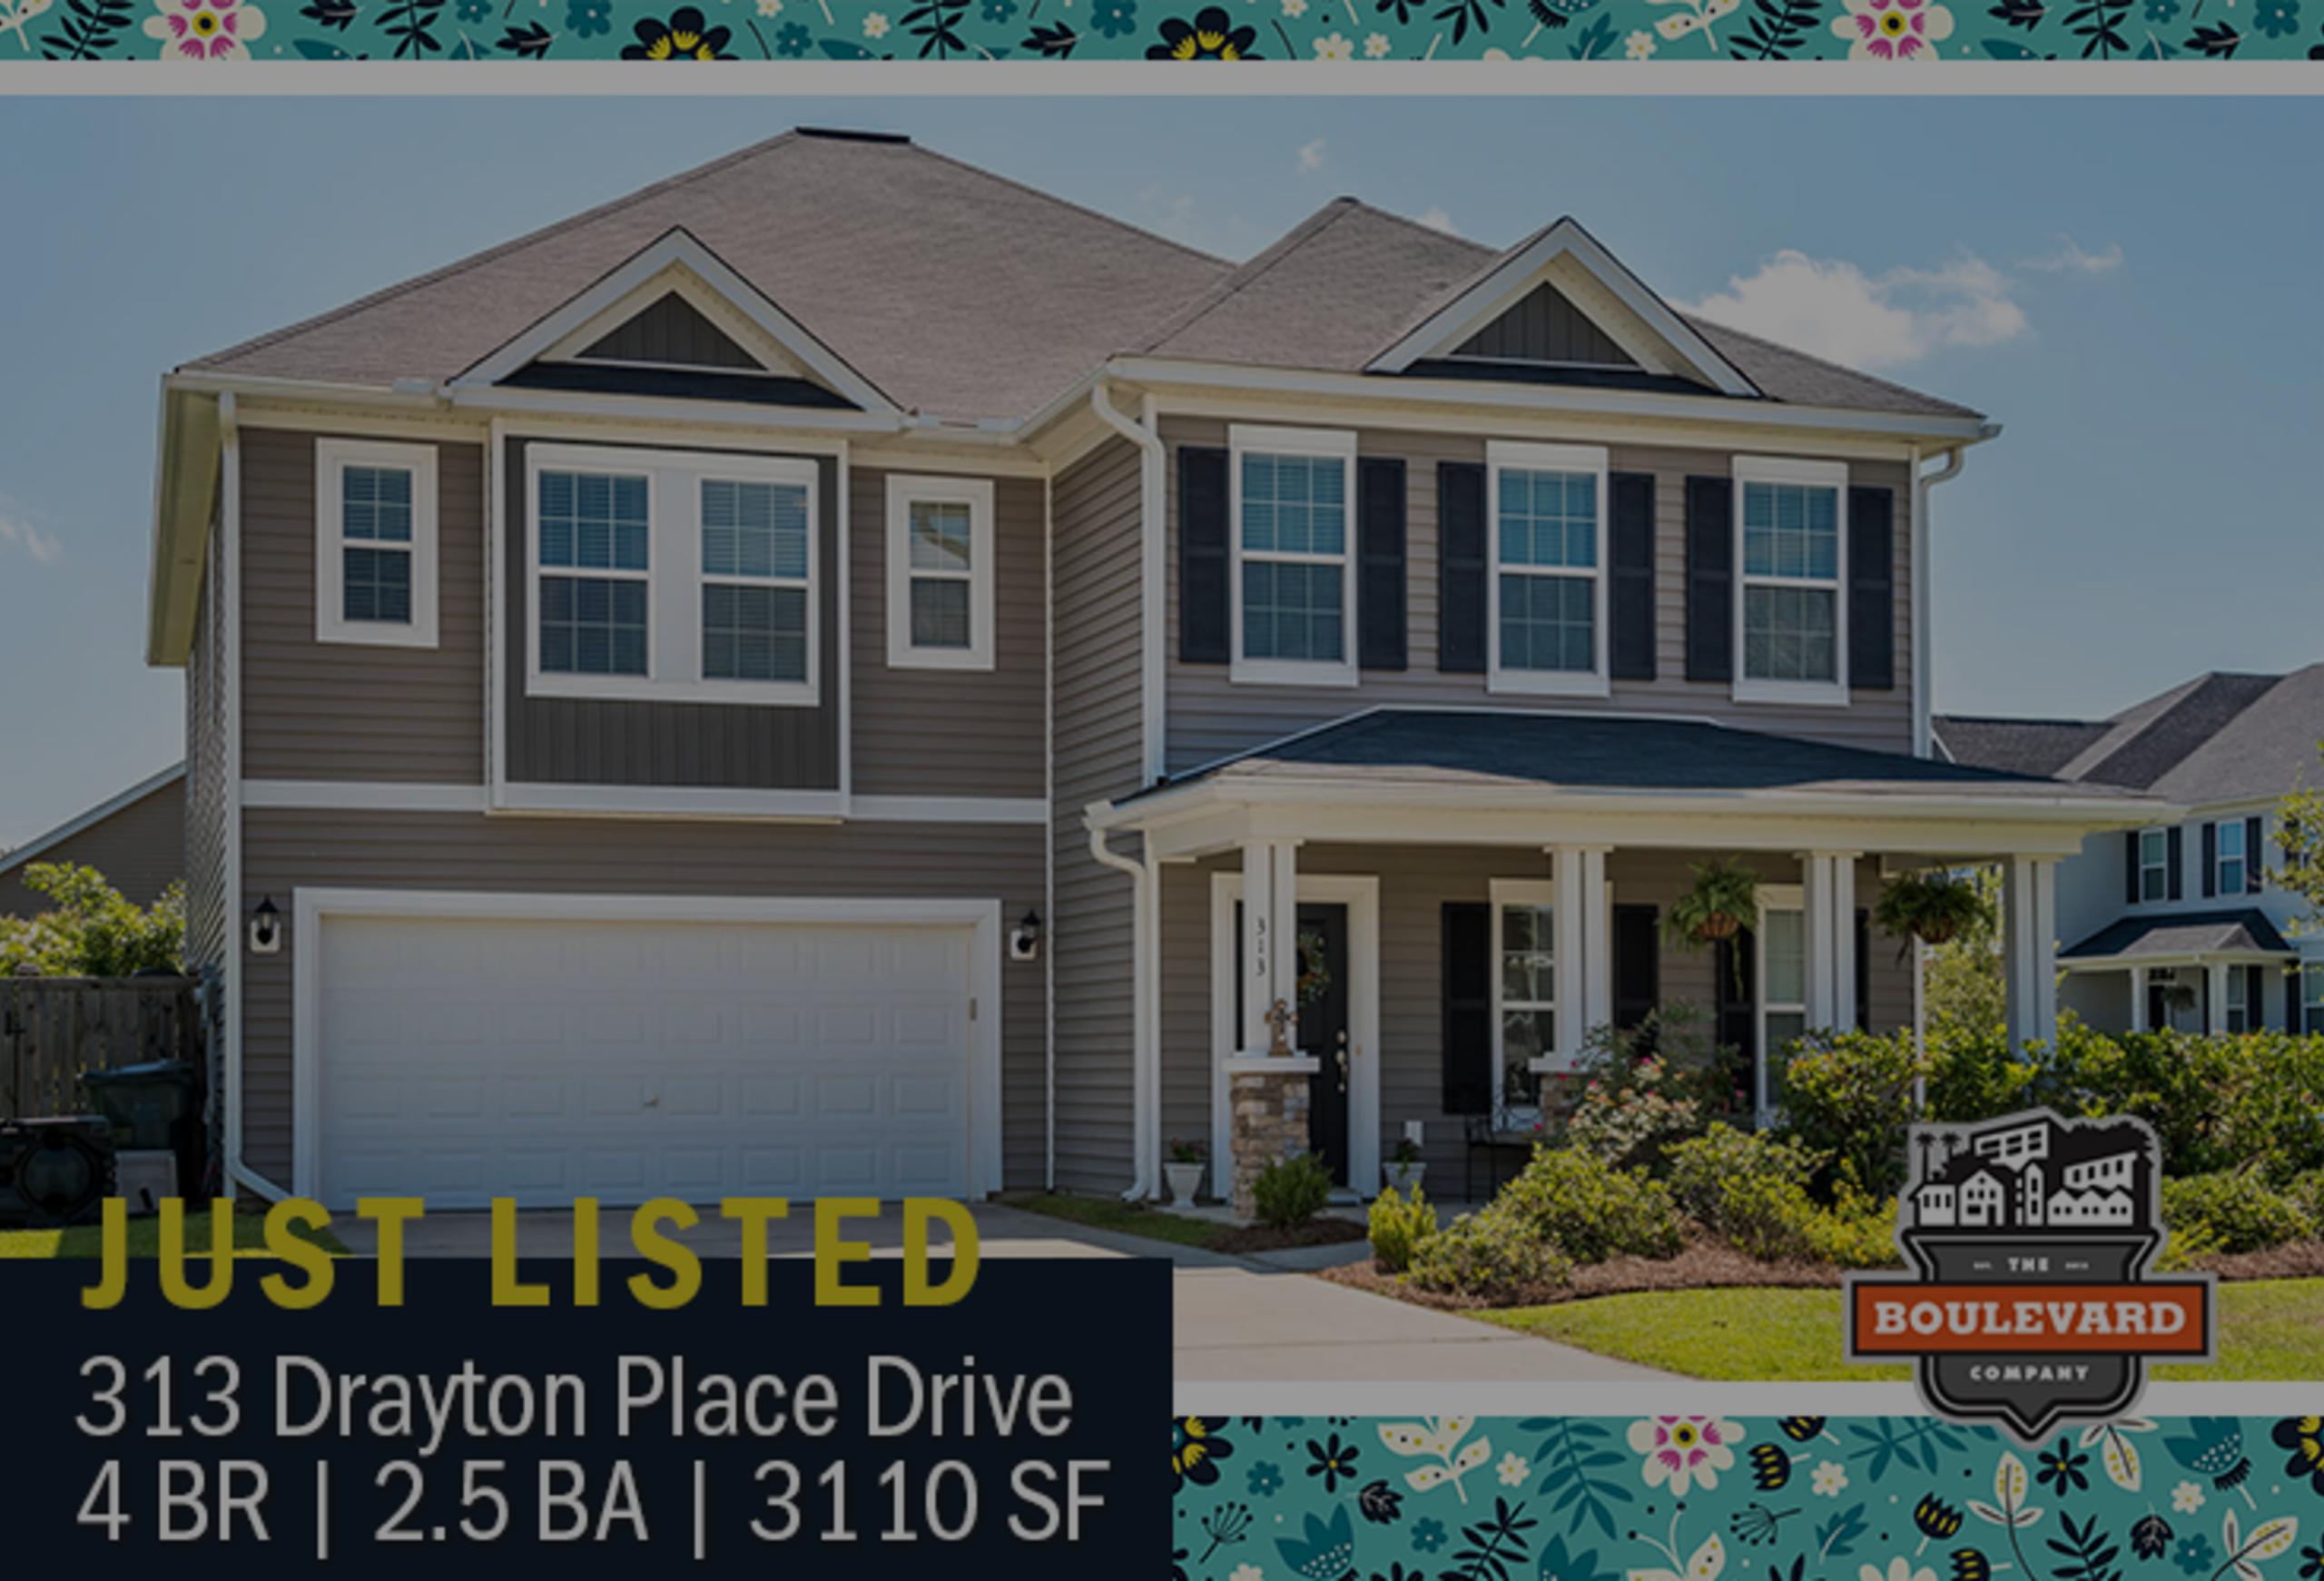 new listing: 313 Drayton Place Drive, Spring Grove Plantation